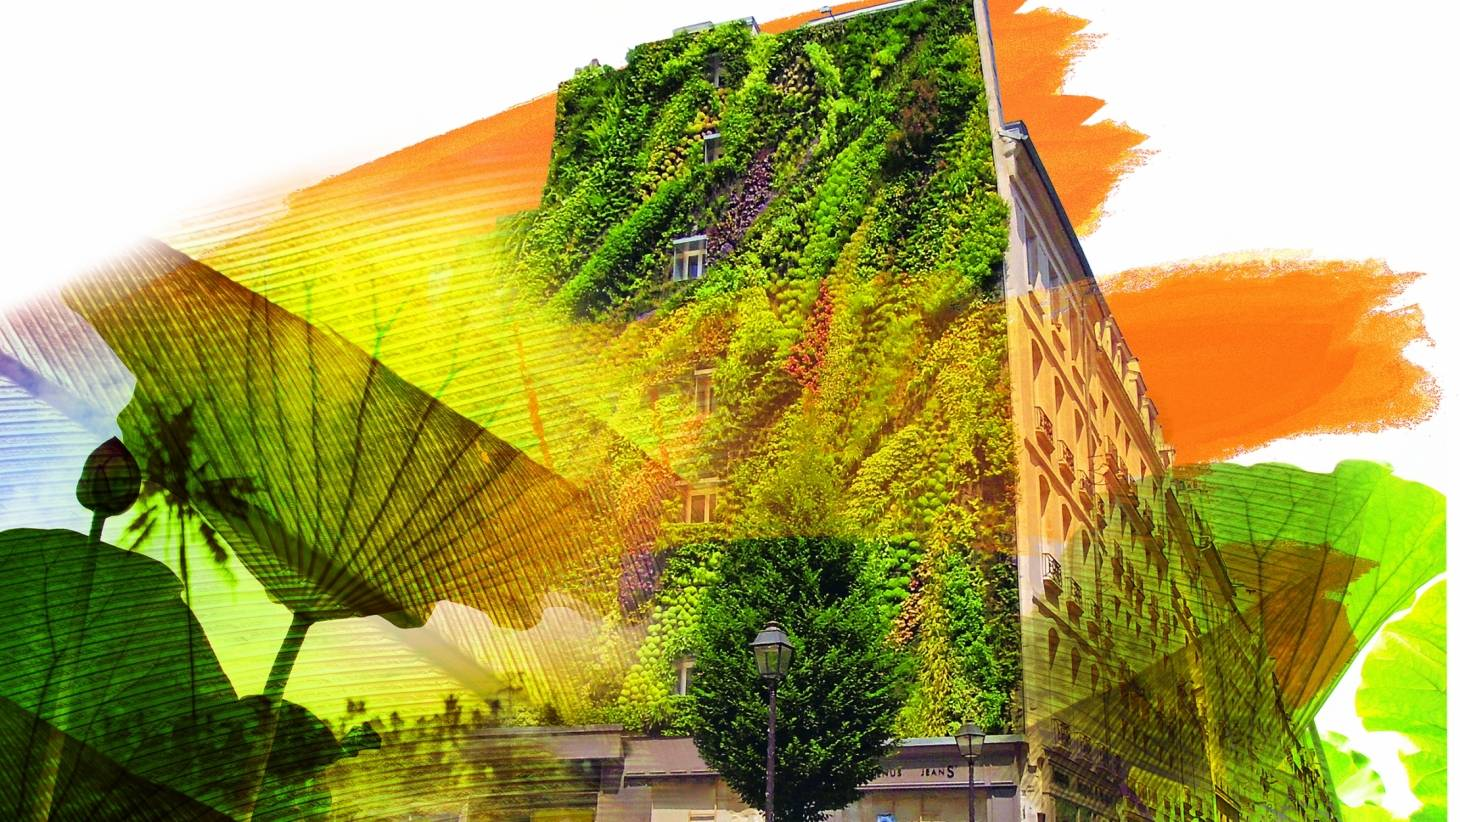 Full Size of Vertical Gardening Systems Garden Design Pdf Indoor System Tower Vertikal Garten Selber Bauen Ideas Pots Patrick Blancs Vertikale Grten Alles Im Grnen Bereich Garten Vertikal Garten